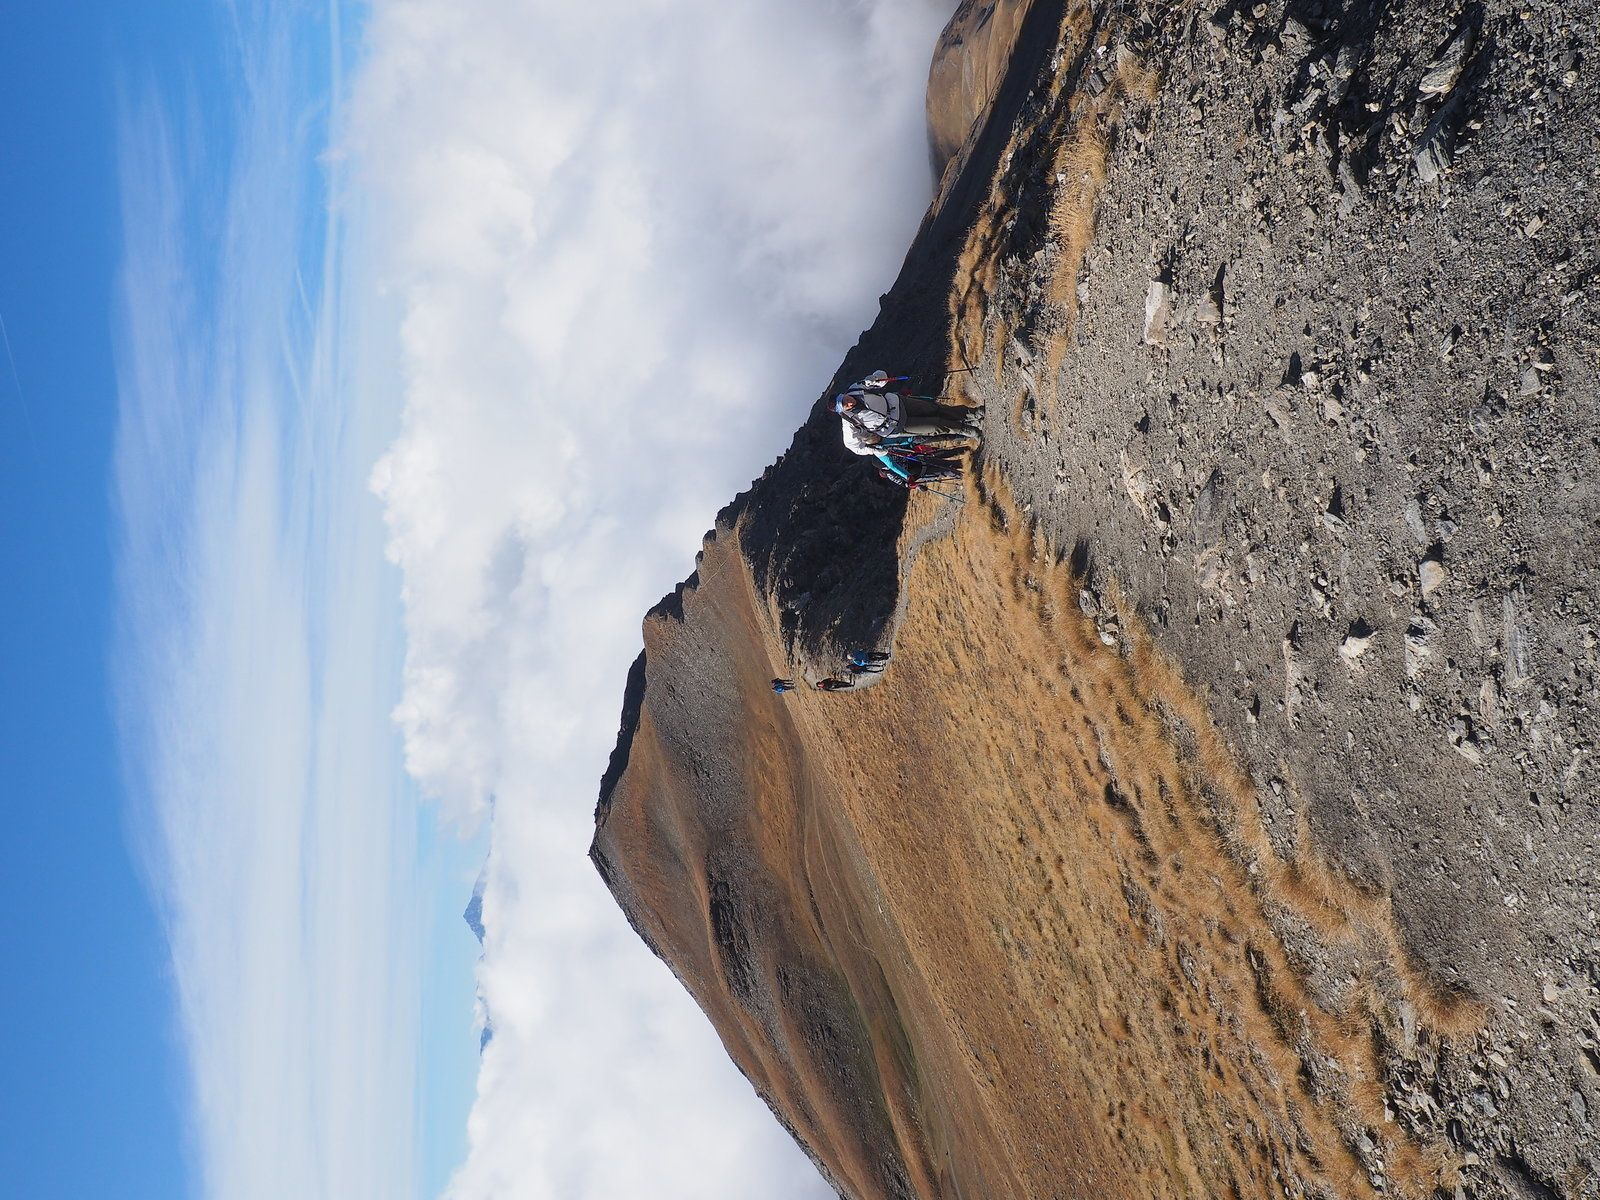 La pointe de Lanserlia 2909 m, Termignon, Bellecombe